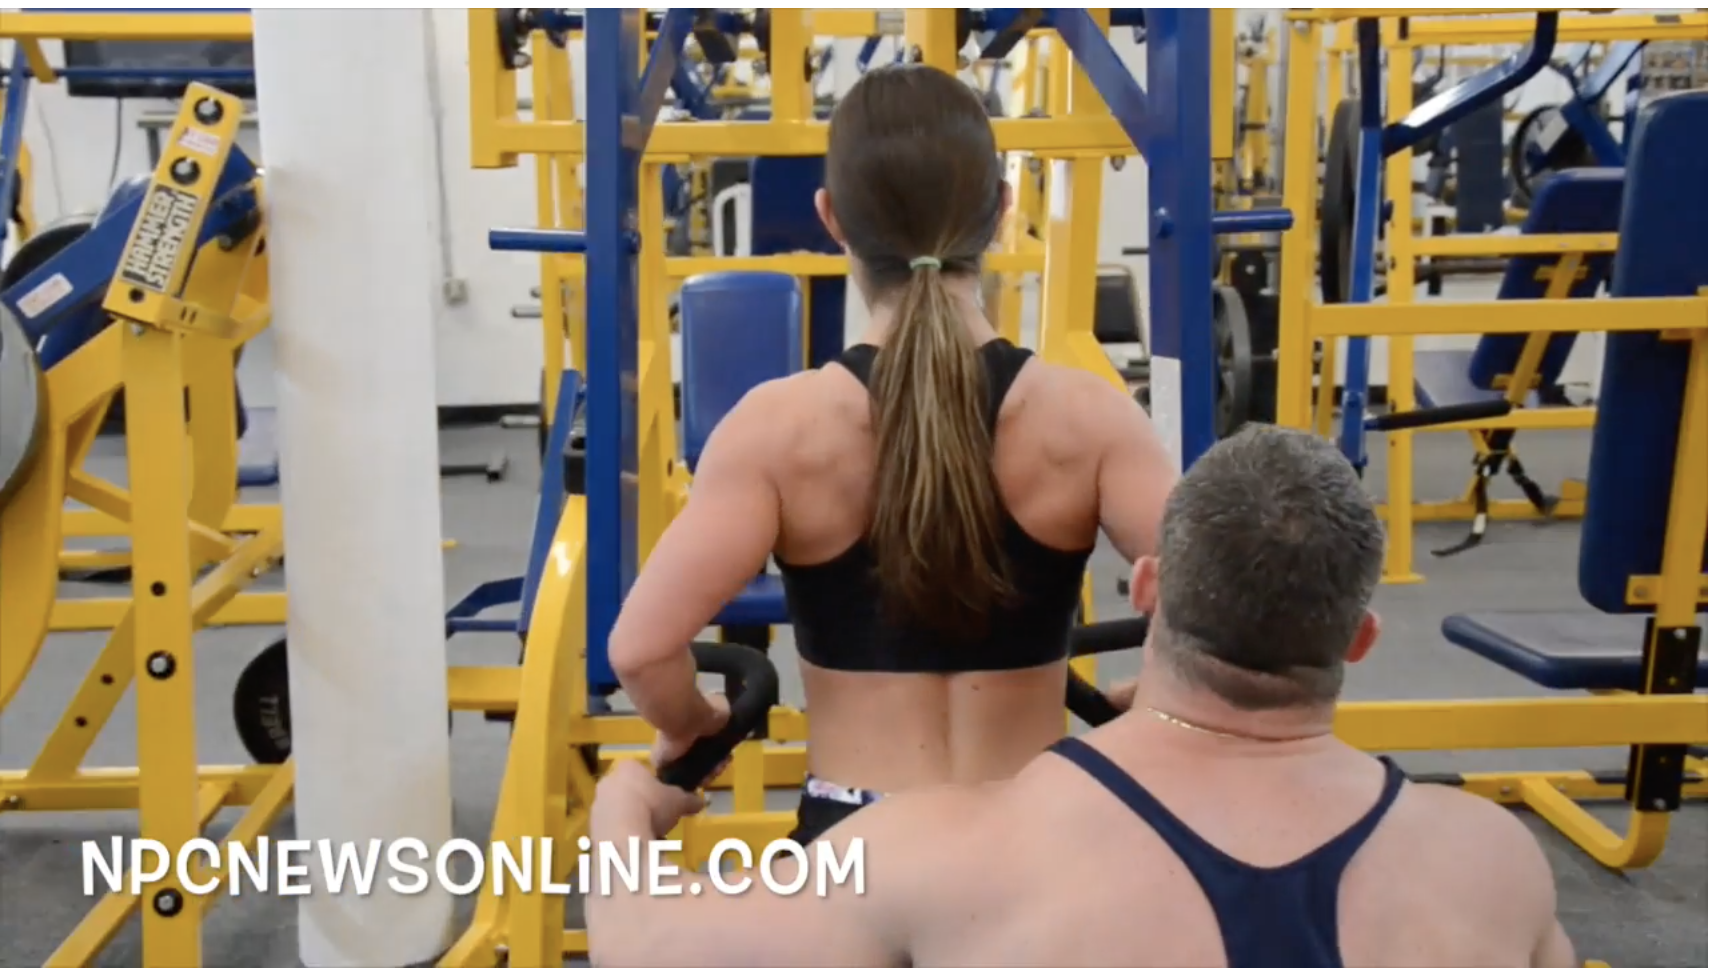 IFBB Fitness Pro Sara KovachBack Workout Video With Bill Sienerth